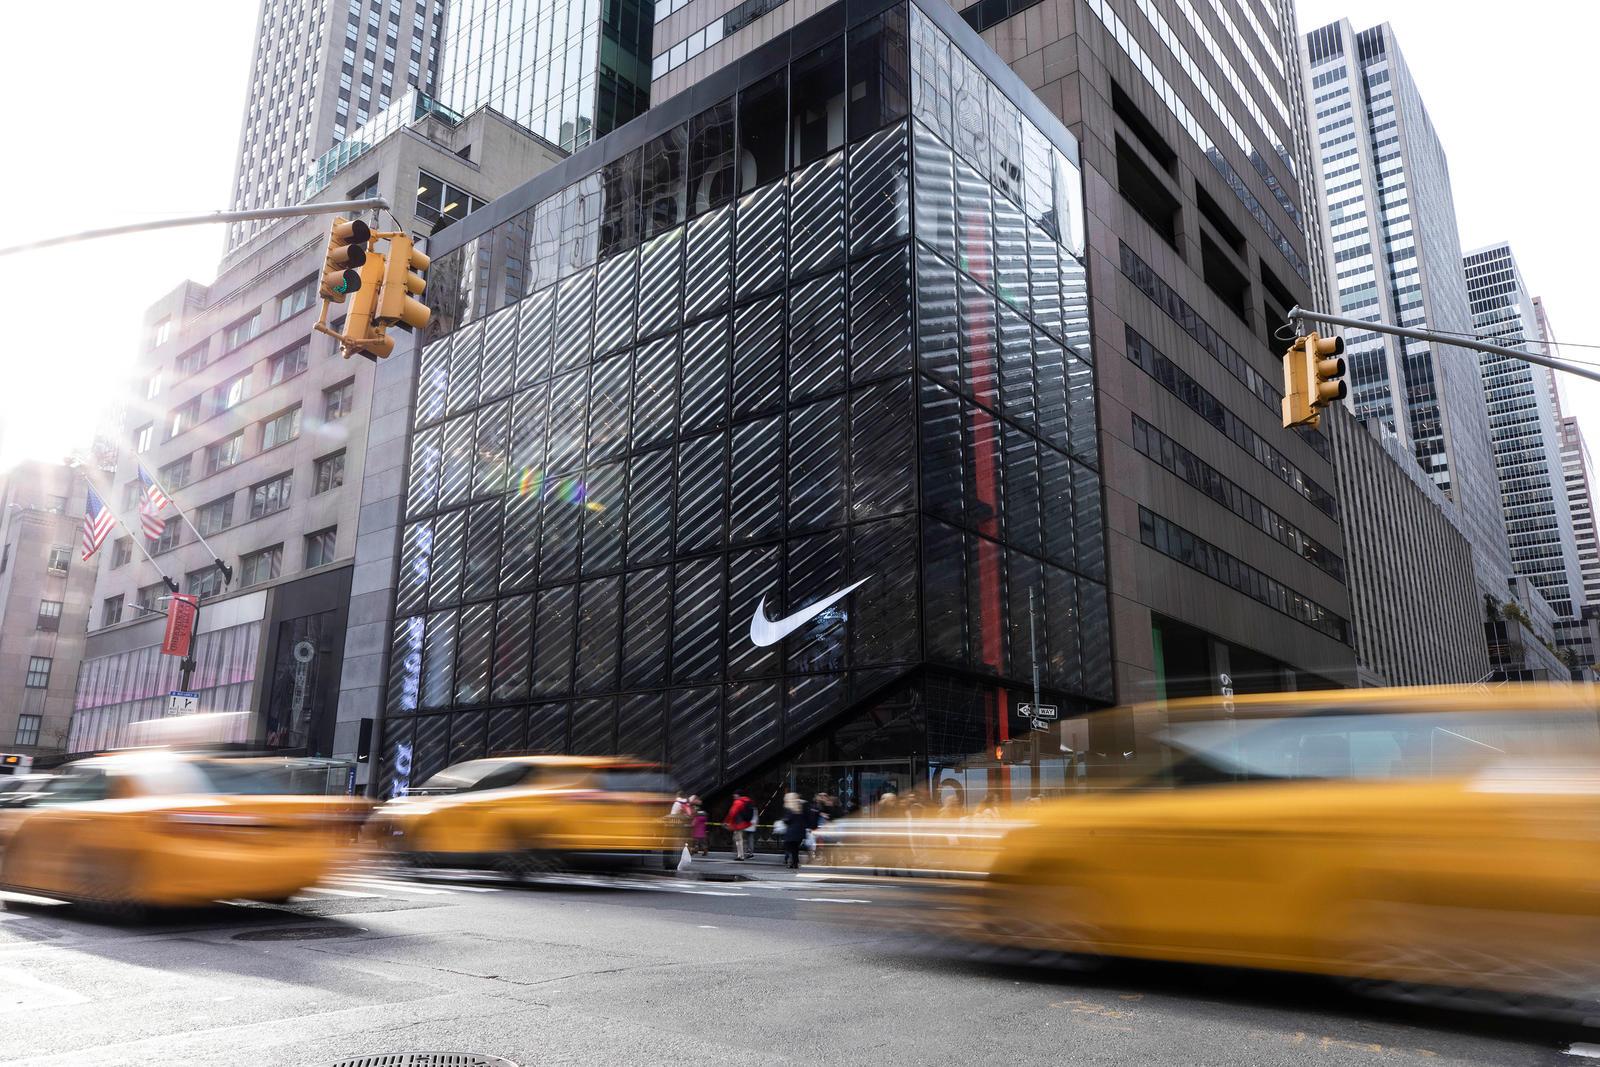 NikeNYC_HouseOfInnovation_hetrick_cleanselects_0087_native_1600.jpg